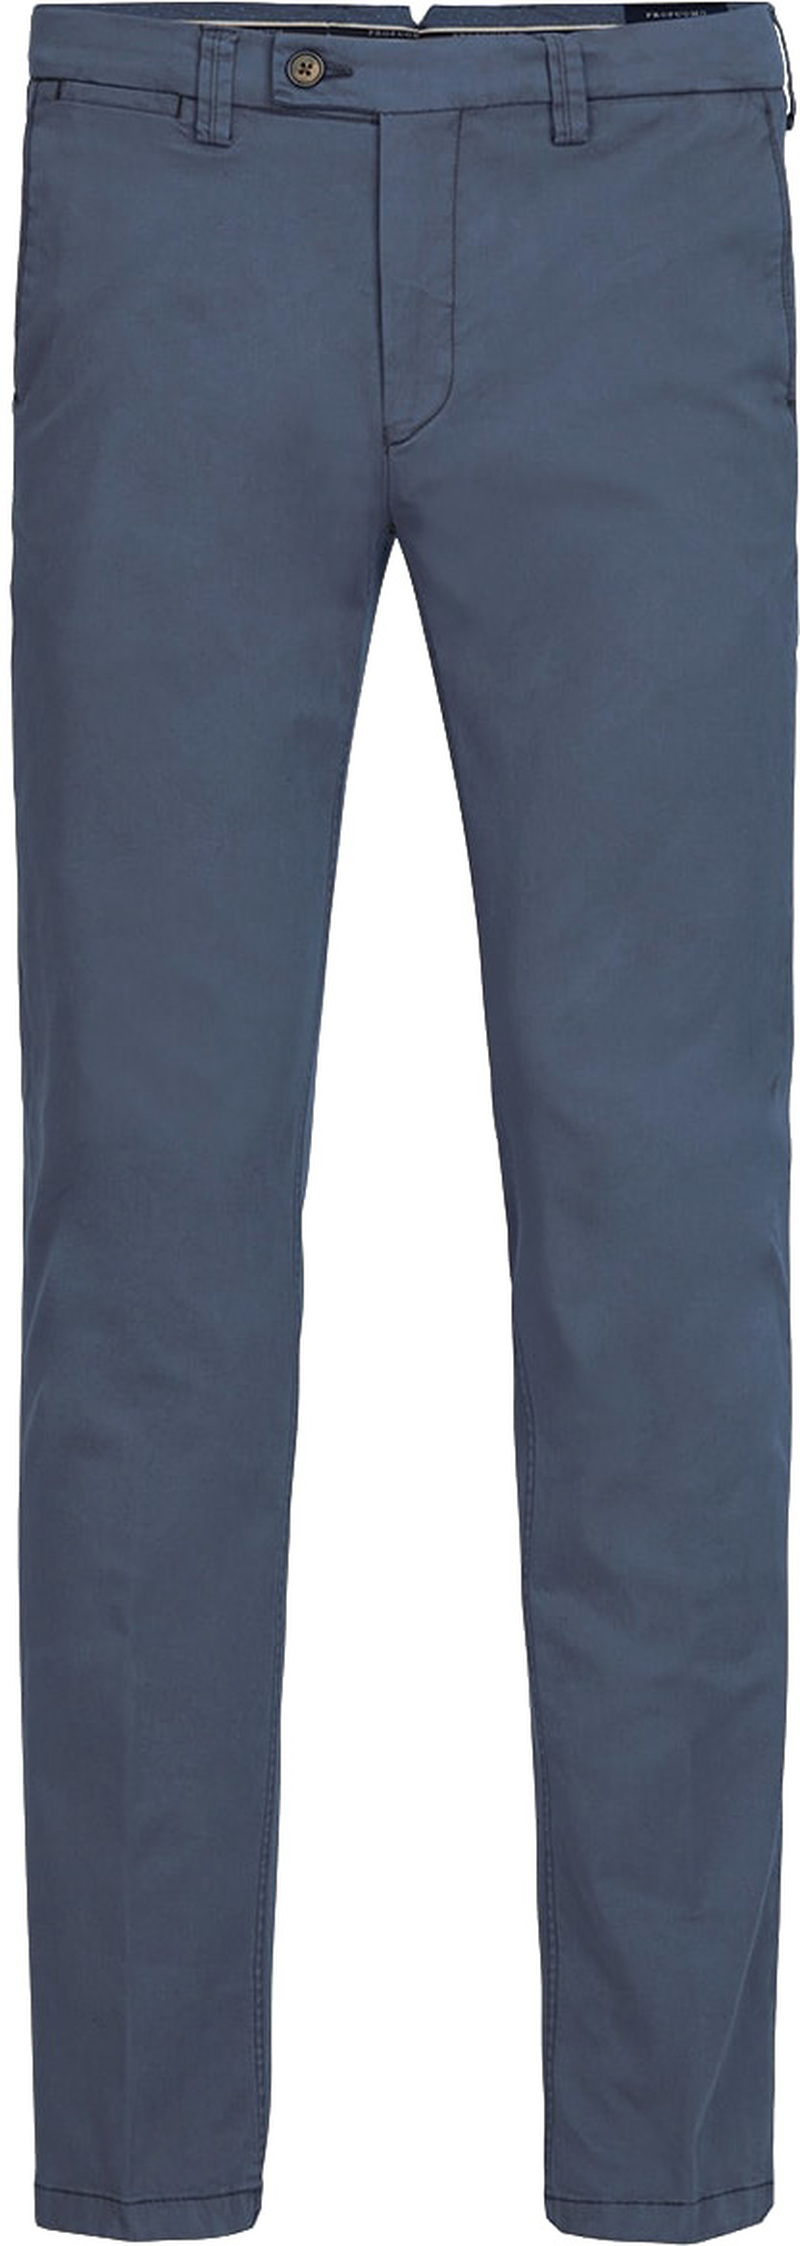 Profuomo Chino Garment DYE Blauw foto 0